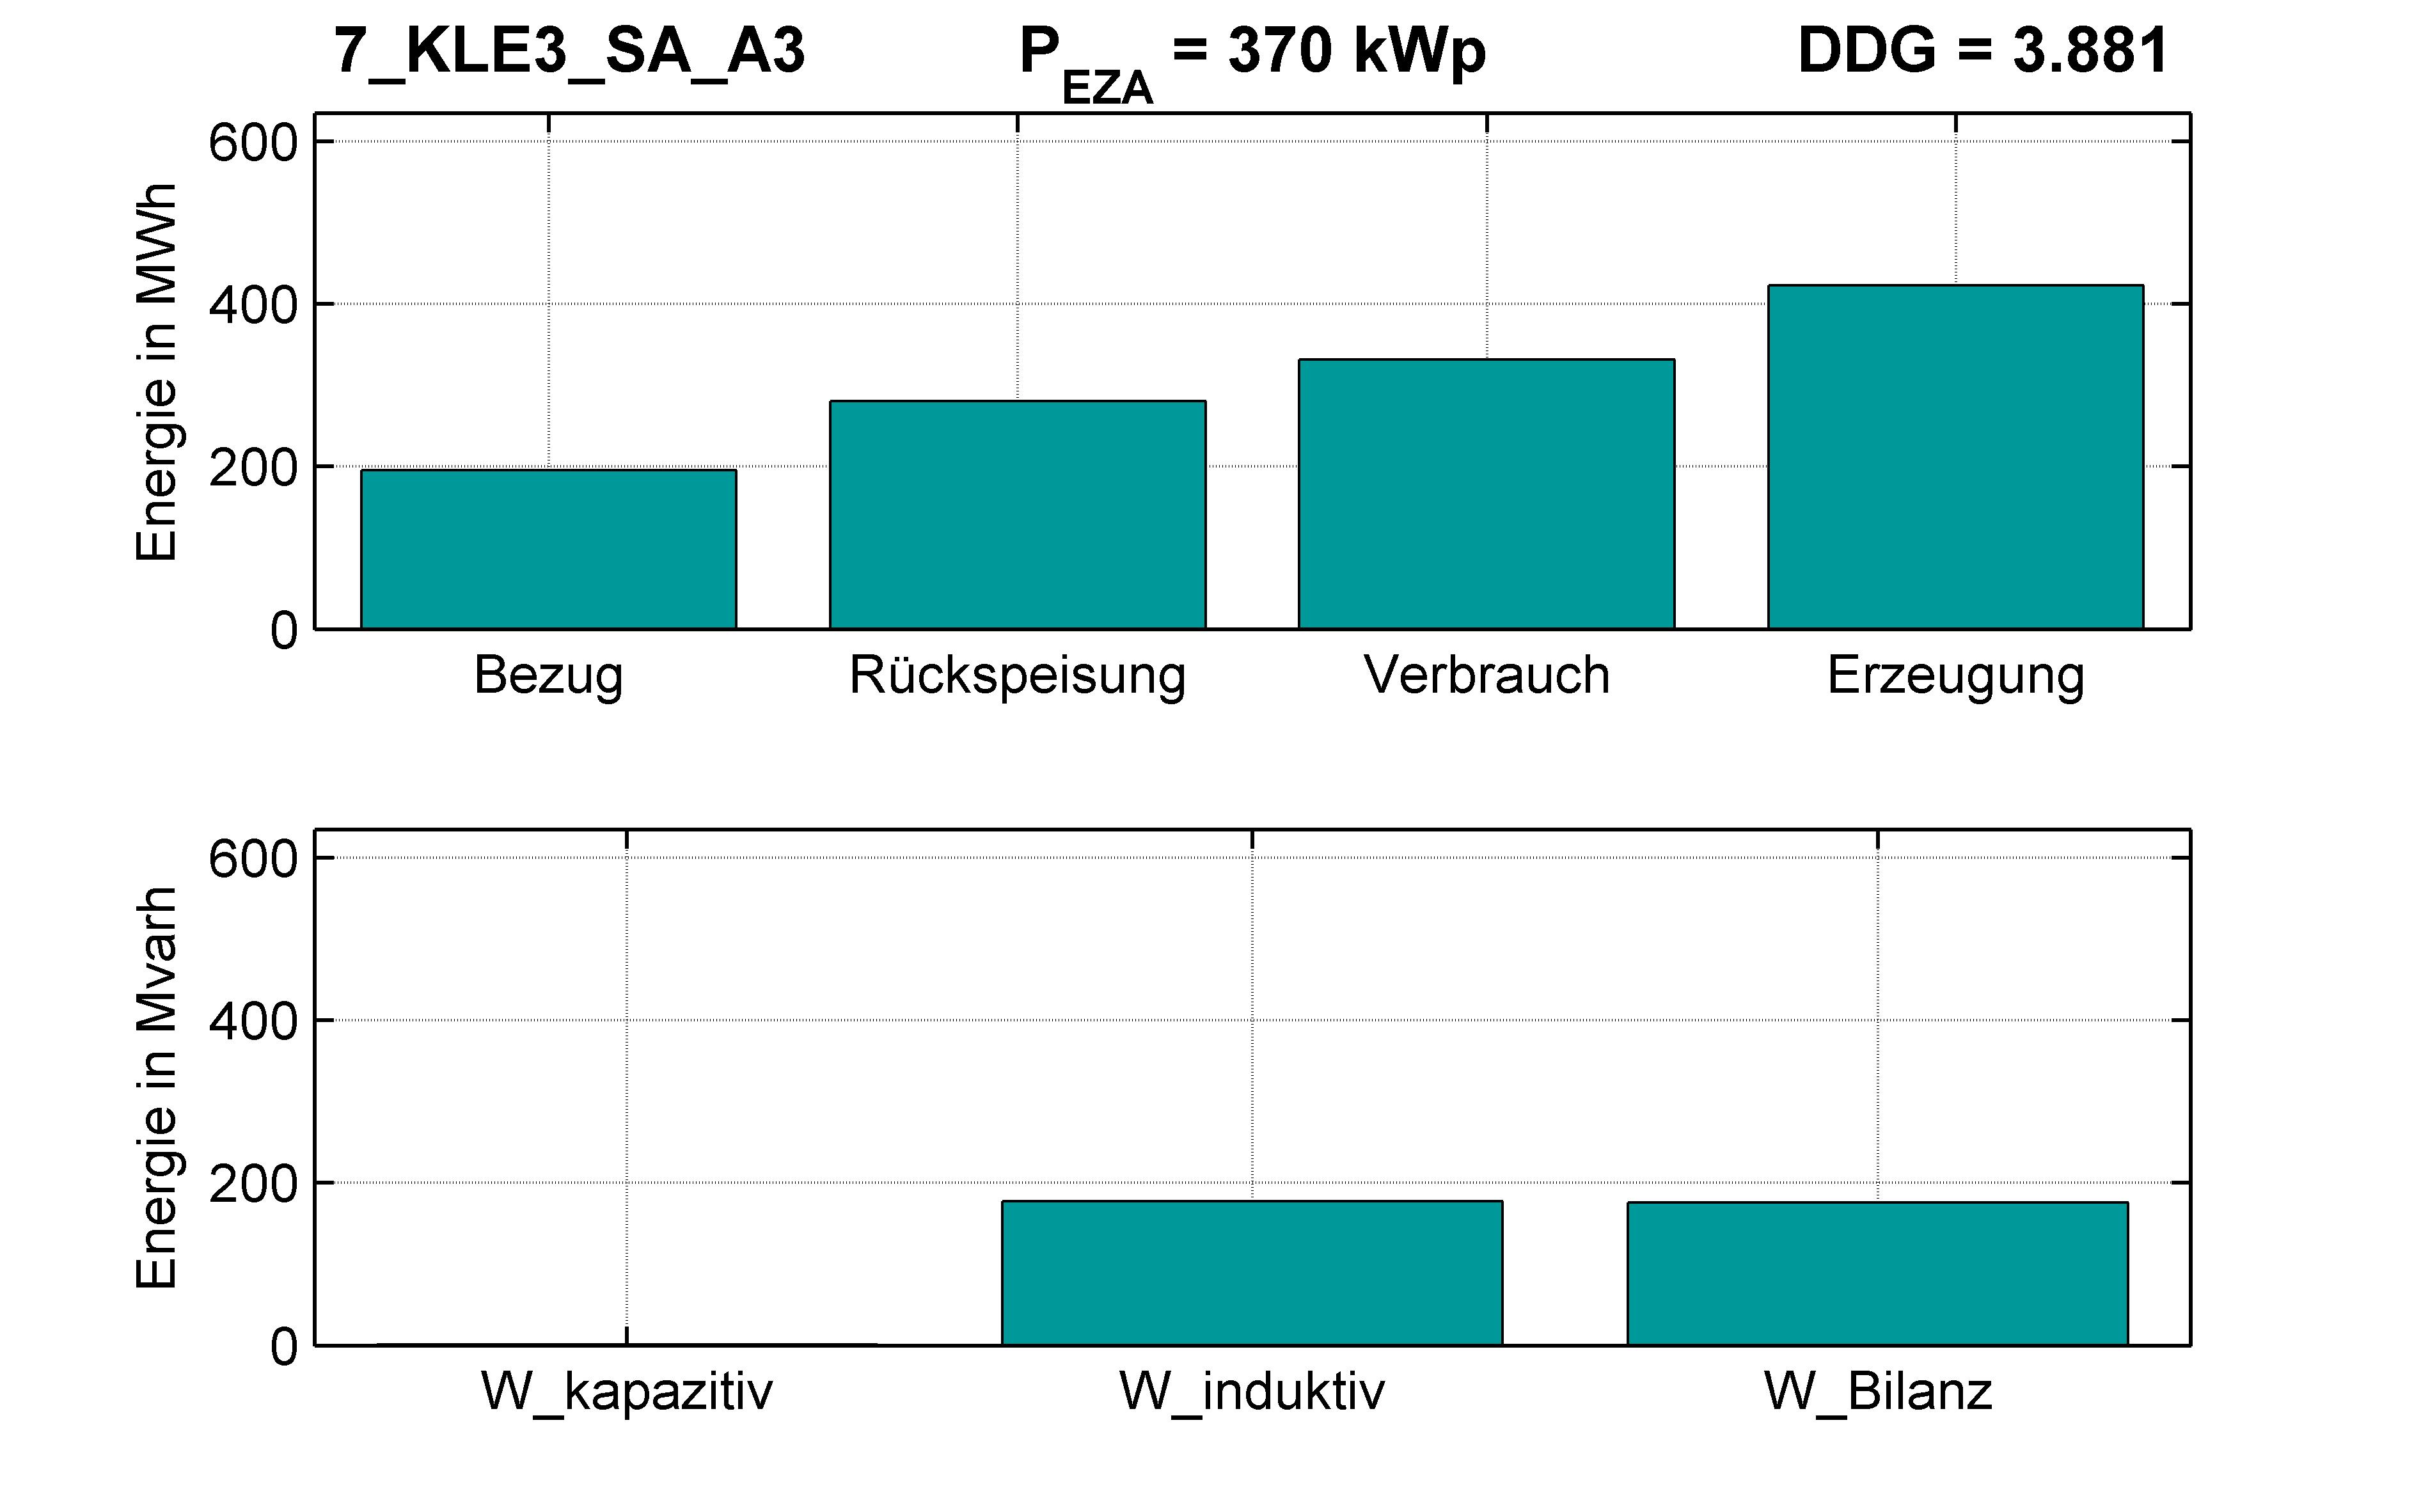 KLE3 | Längsregler (SA) A3 | PQ-Bilanz